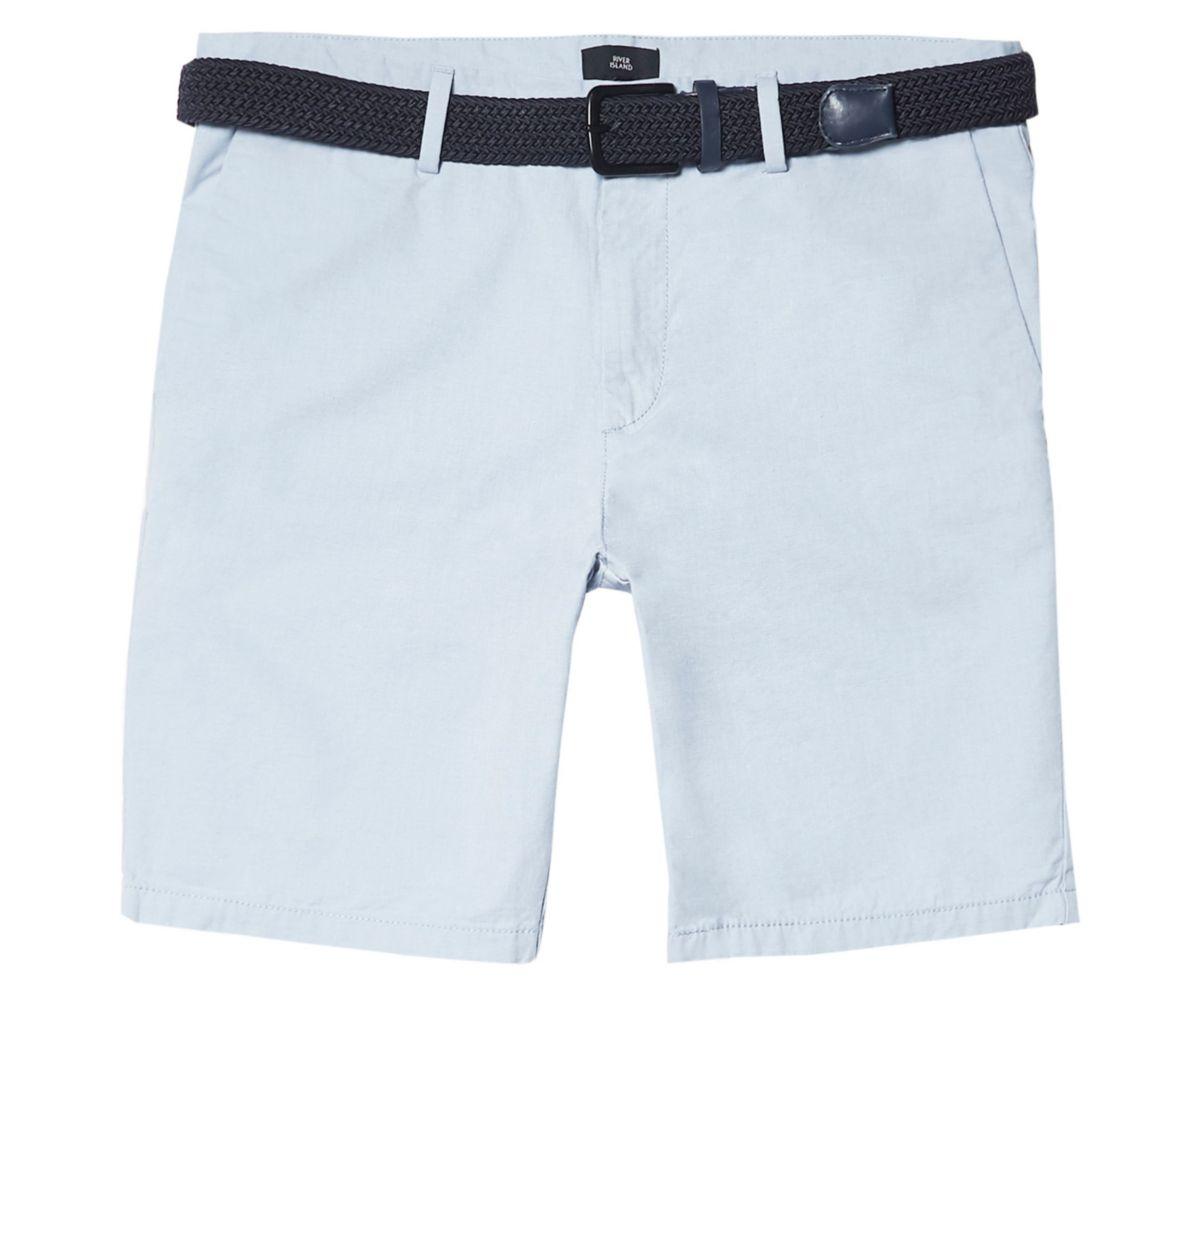 Big & Tall – Hellblaue Chino-Shorts mit Gürtel